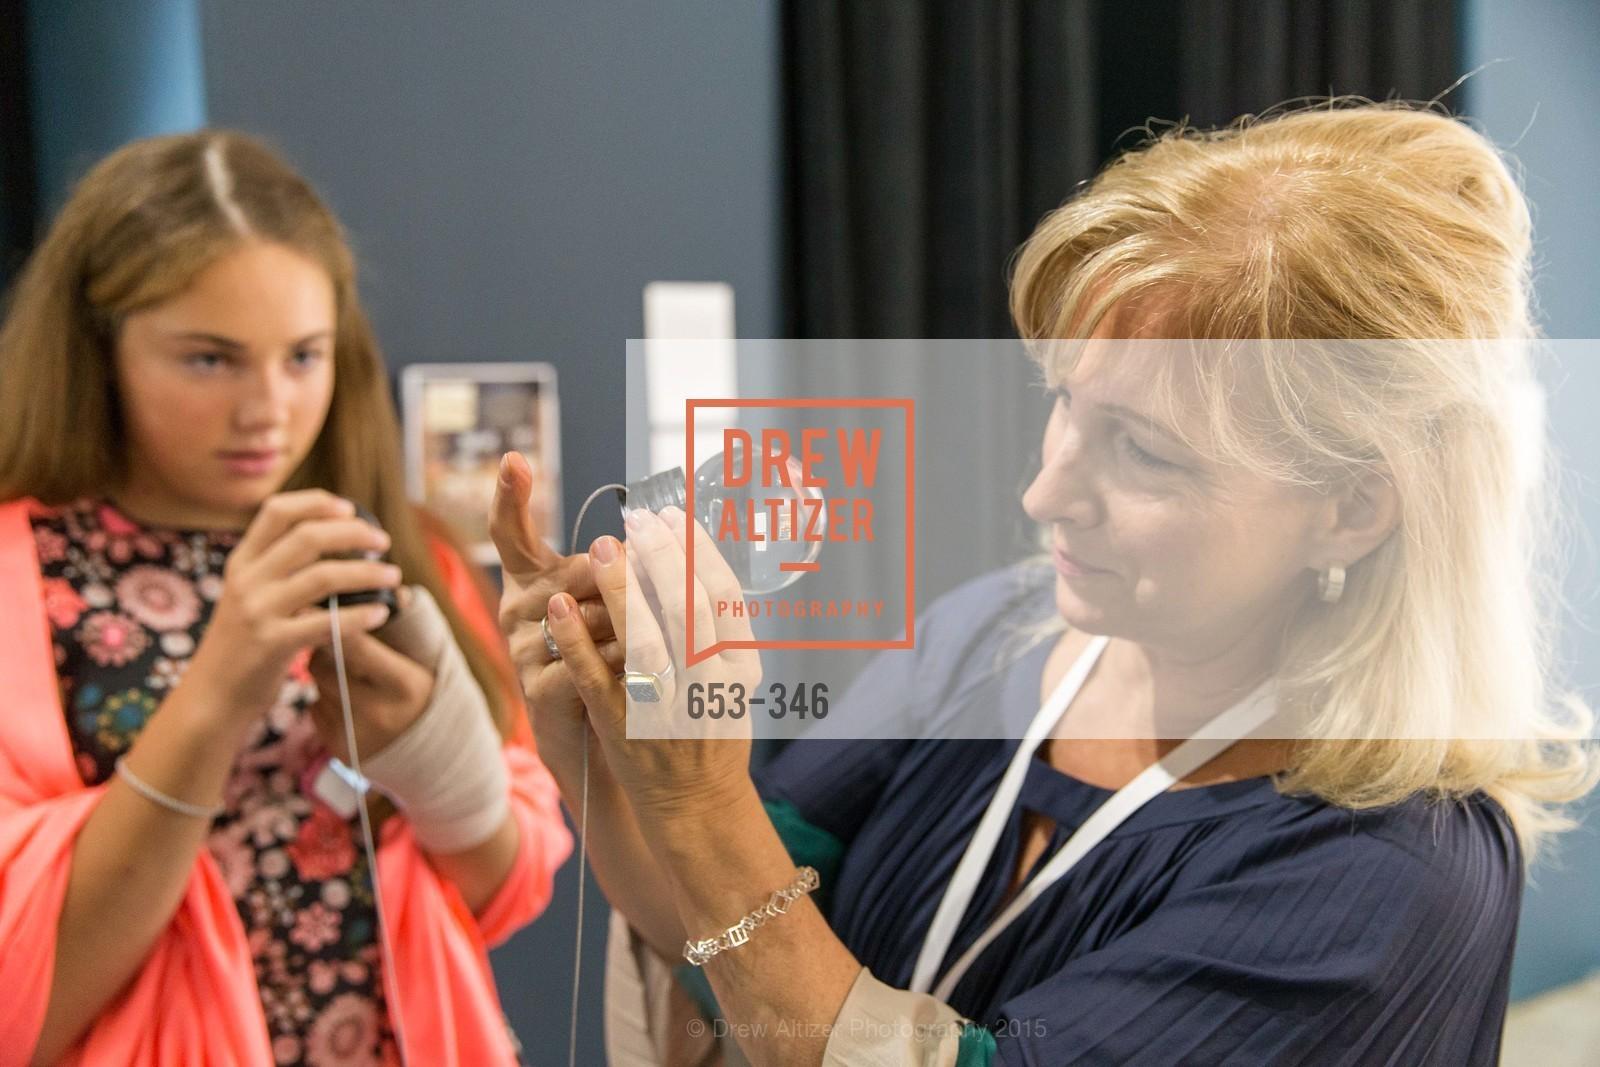 Allison Lipe-Cross, Art Miami Presents: Art Silicon Valley, San Mateo County Event Center. 1346 Saratoga Dr, October 8th, 2015,Drew Altizer, Drew Altizer Photography, full-service agency, private events, San Francisco photographer, photographer california